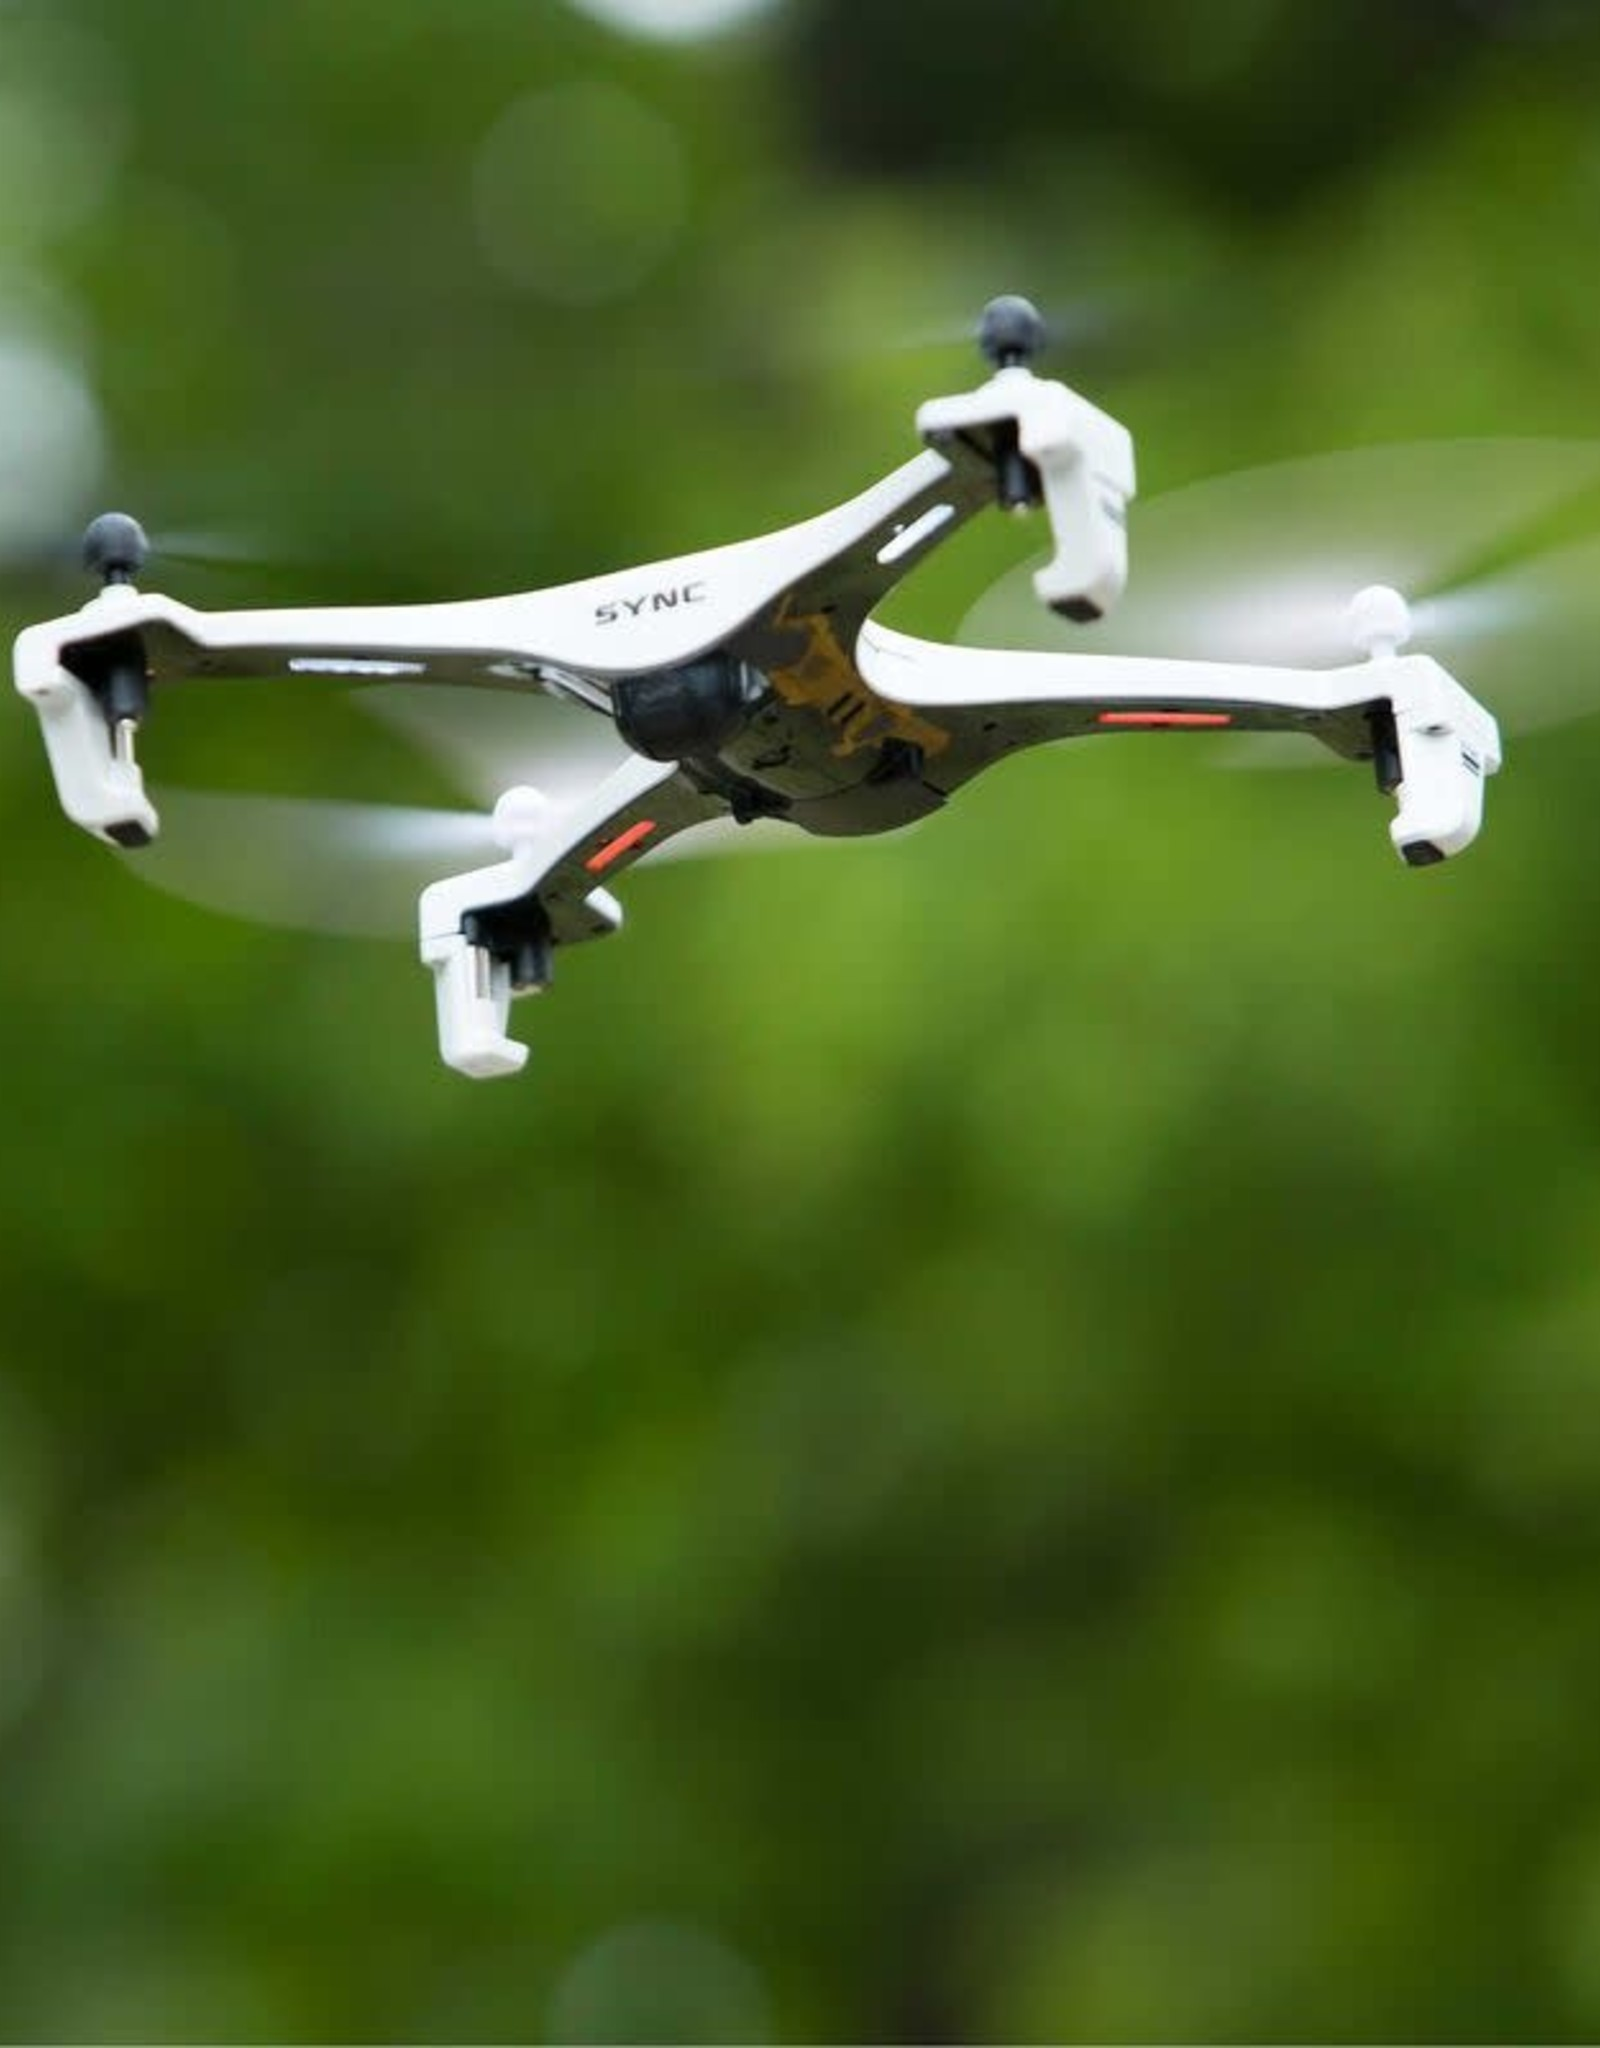 DROMIDA DIDH1100 Sync 251 Drone RTF no camera!